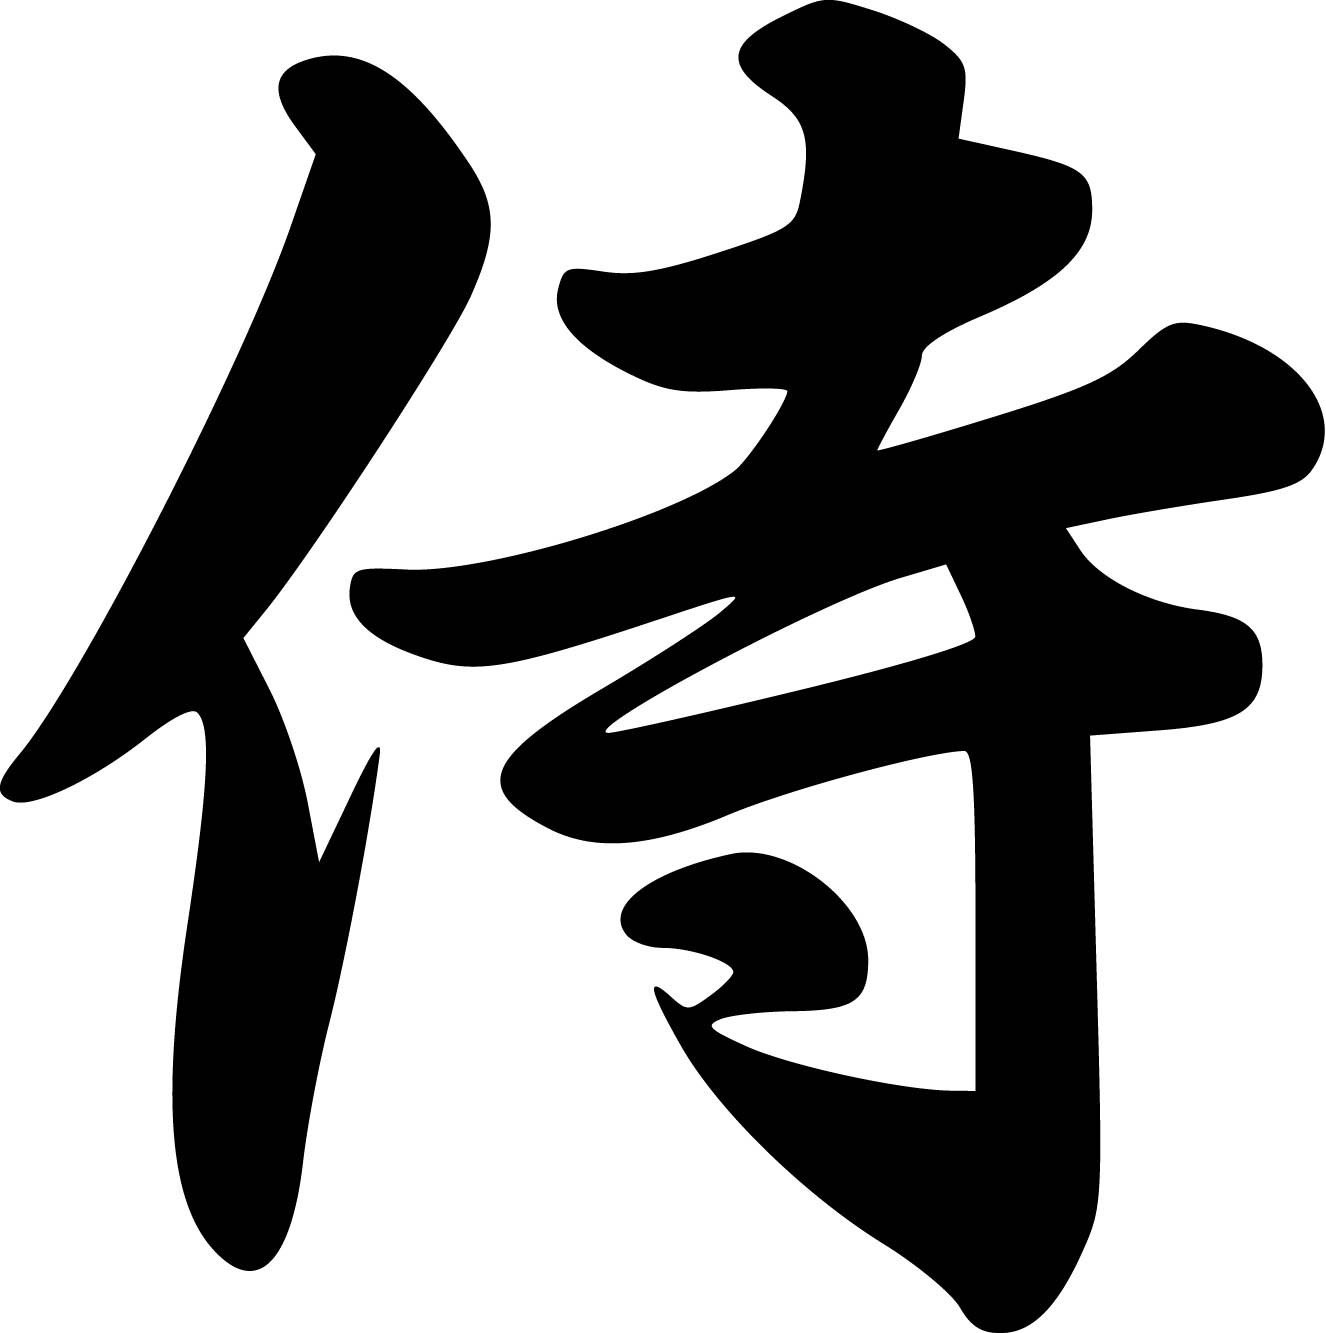 Amazon jdm kanji samurai japan japanese euro drift street amazon jdm kanji samurai japan japanese euro drift street racing car decal sticker vinyl die cut choose color automotive biocorpaavc Image collections